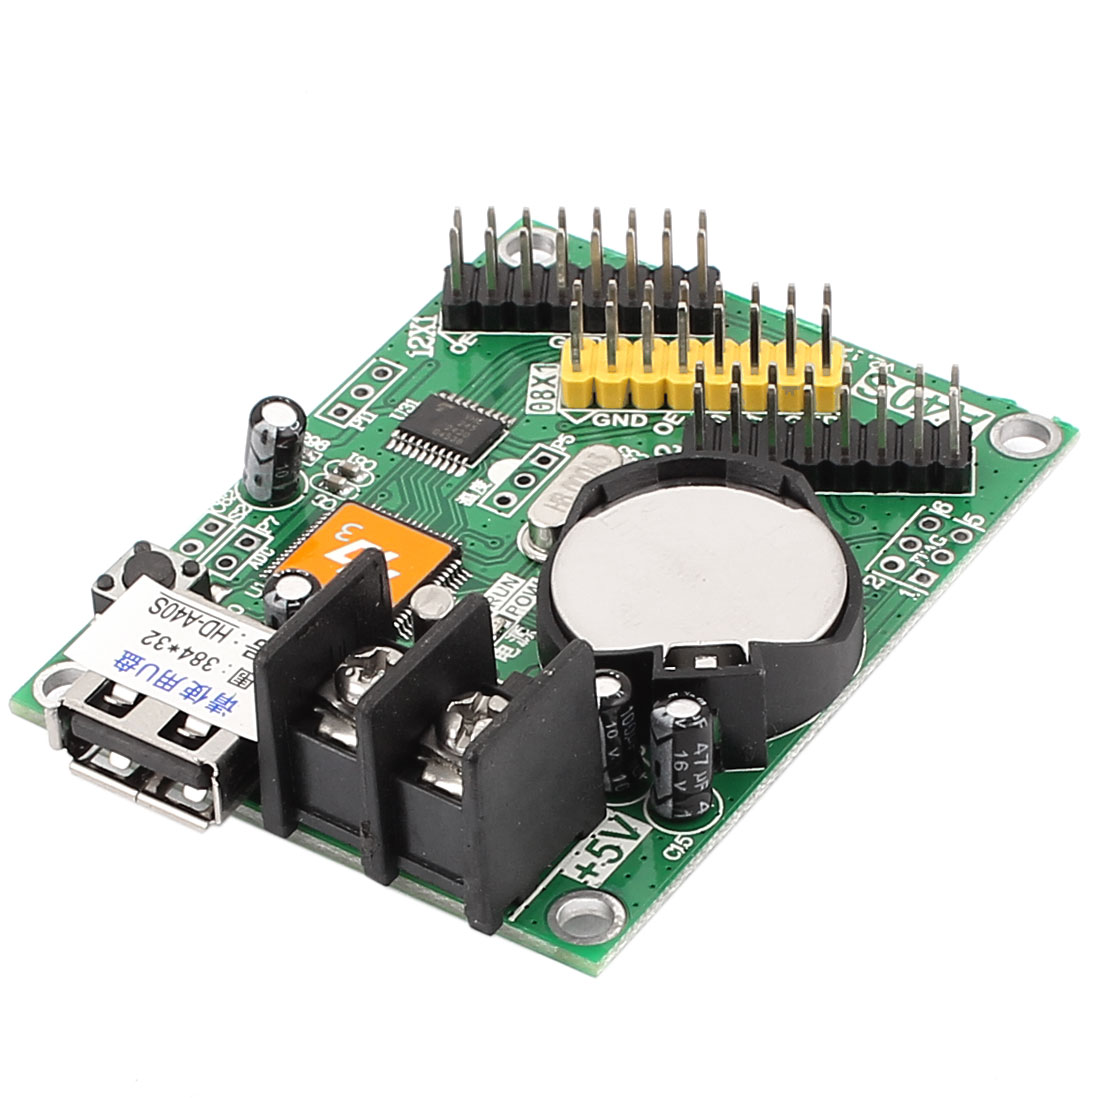 HD-A40S USB Port LED Subtitle Screen Display Control Card P10 Module